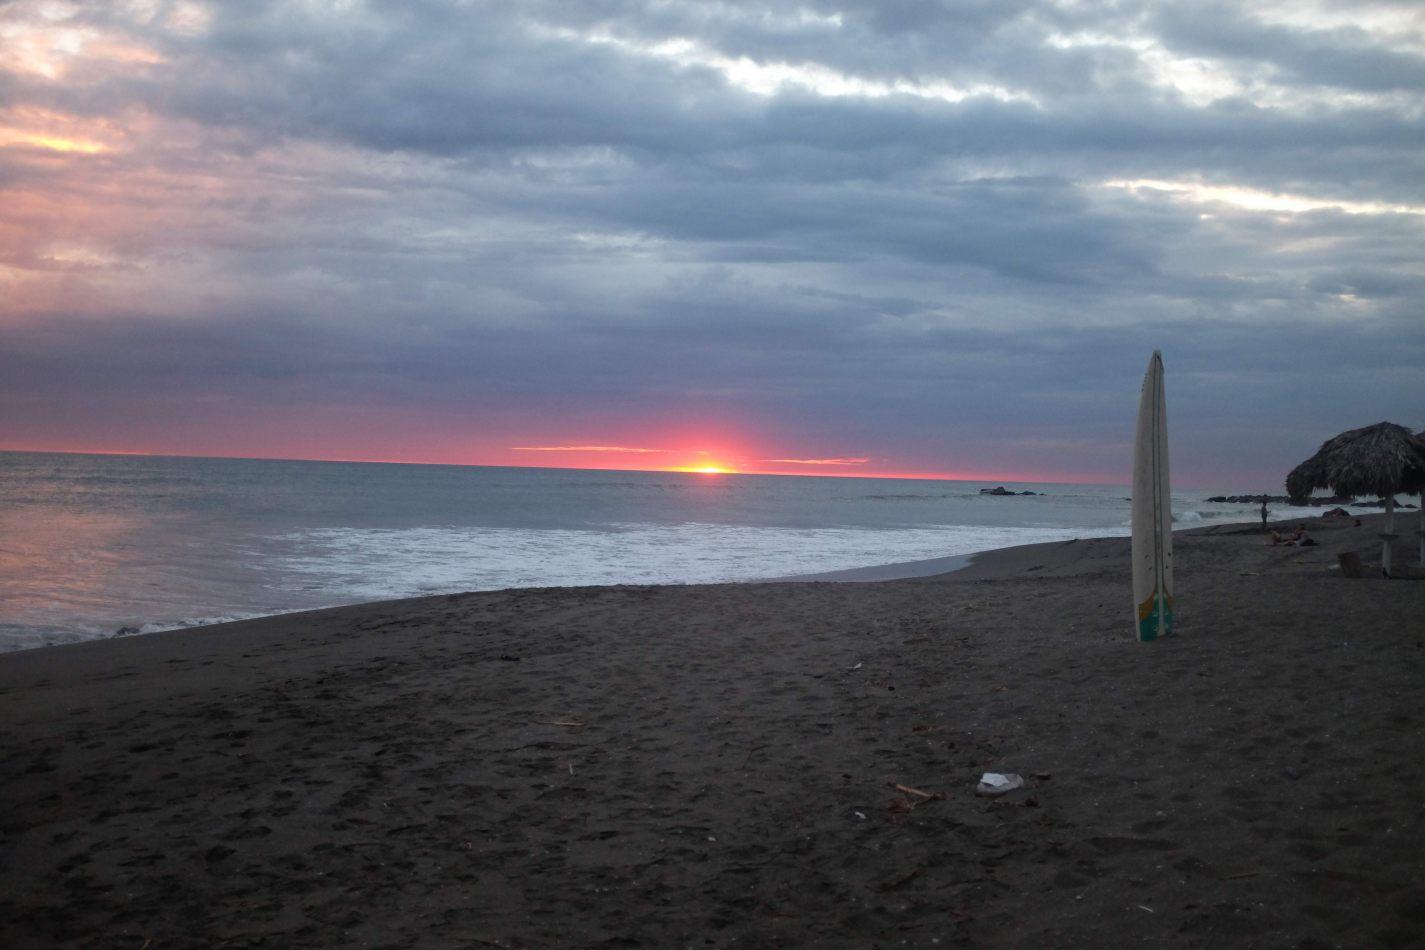 Hibiscus & Nomada : - - Sunset at Playa Roca